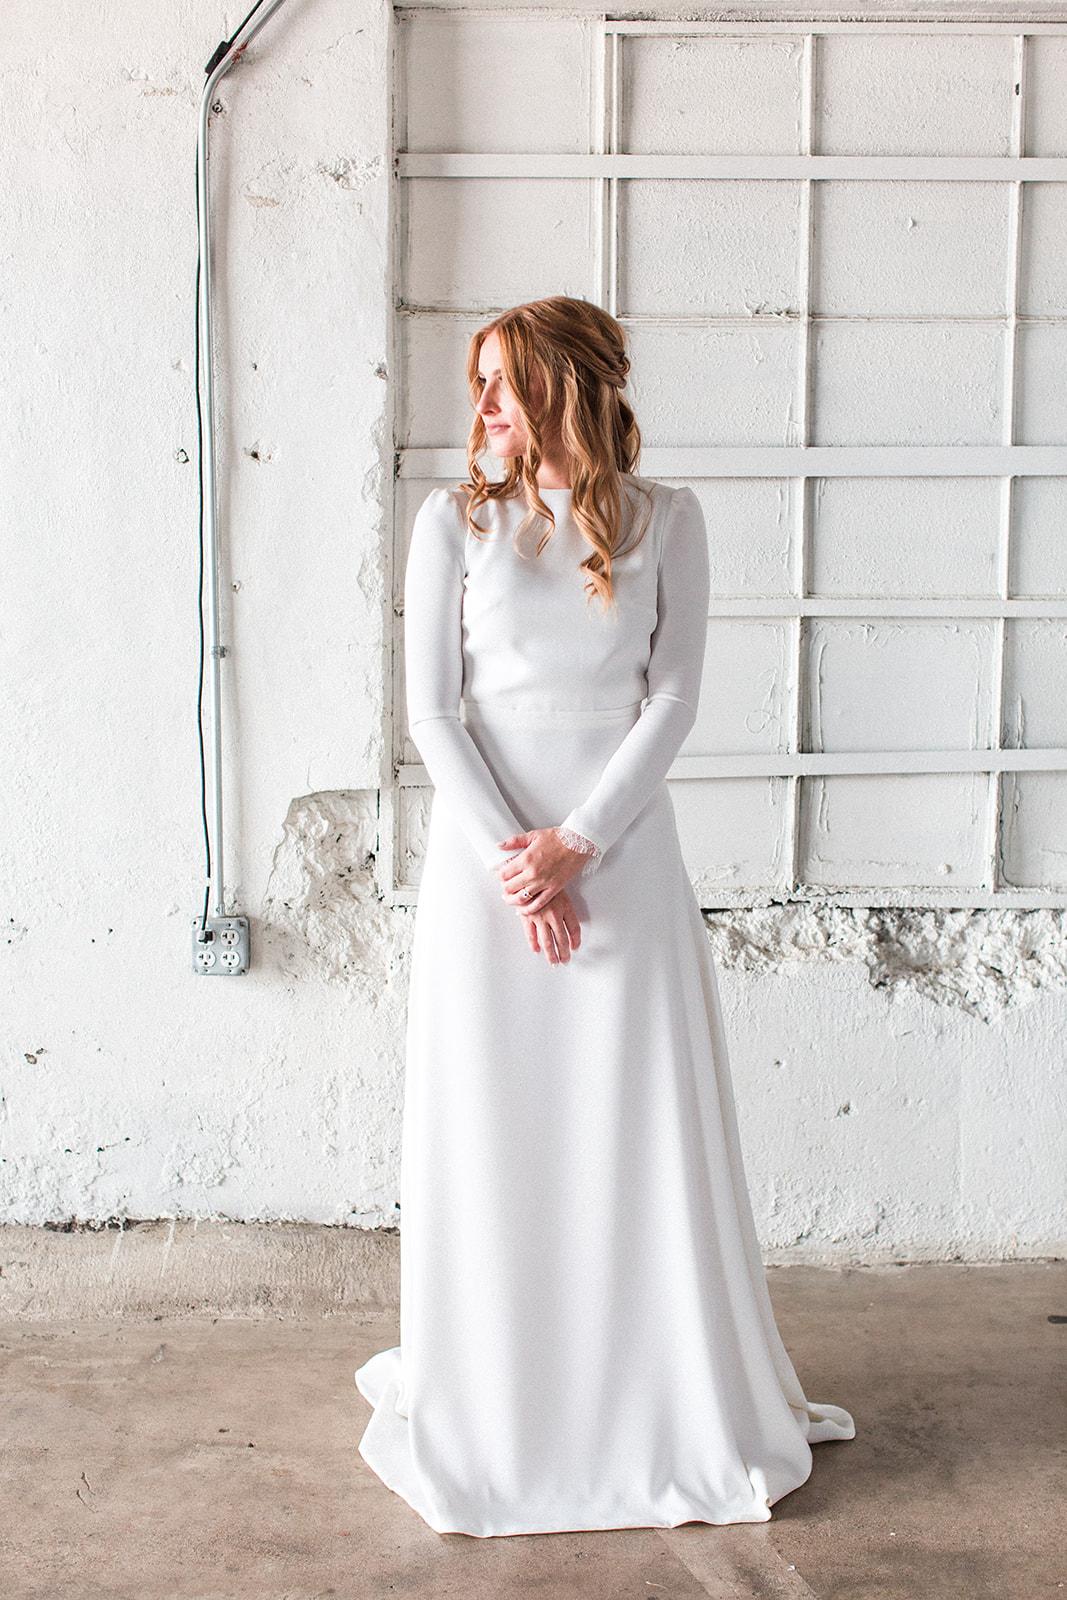 Fall wedding dress: Fall Garden Wedding featured on Alexa Kay Events